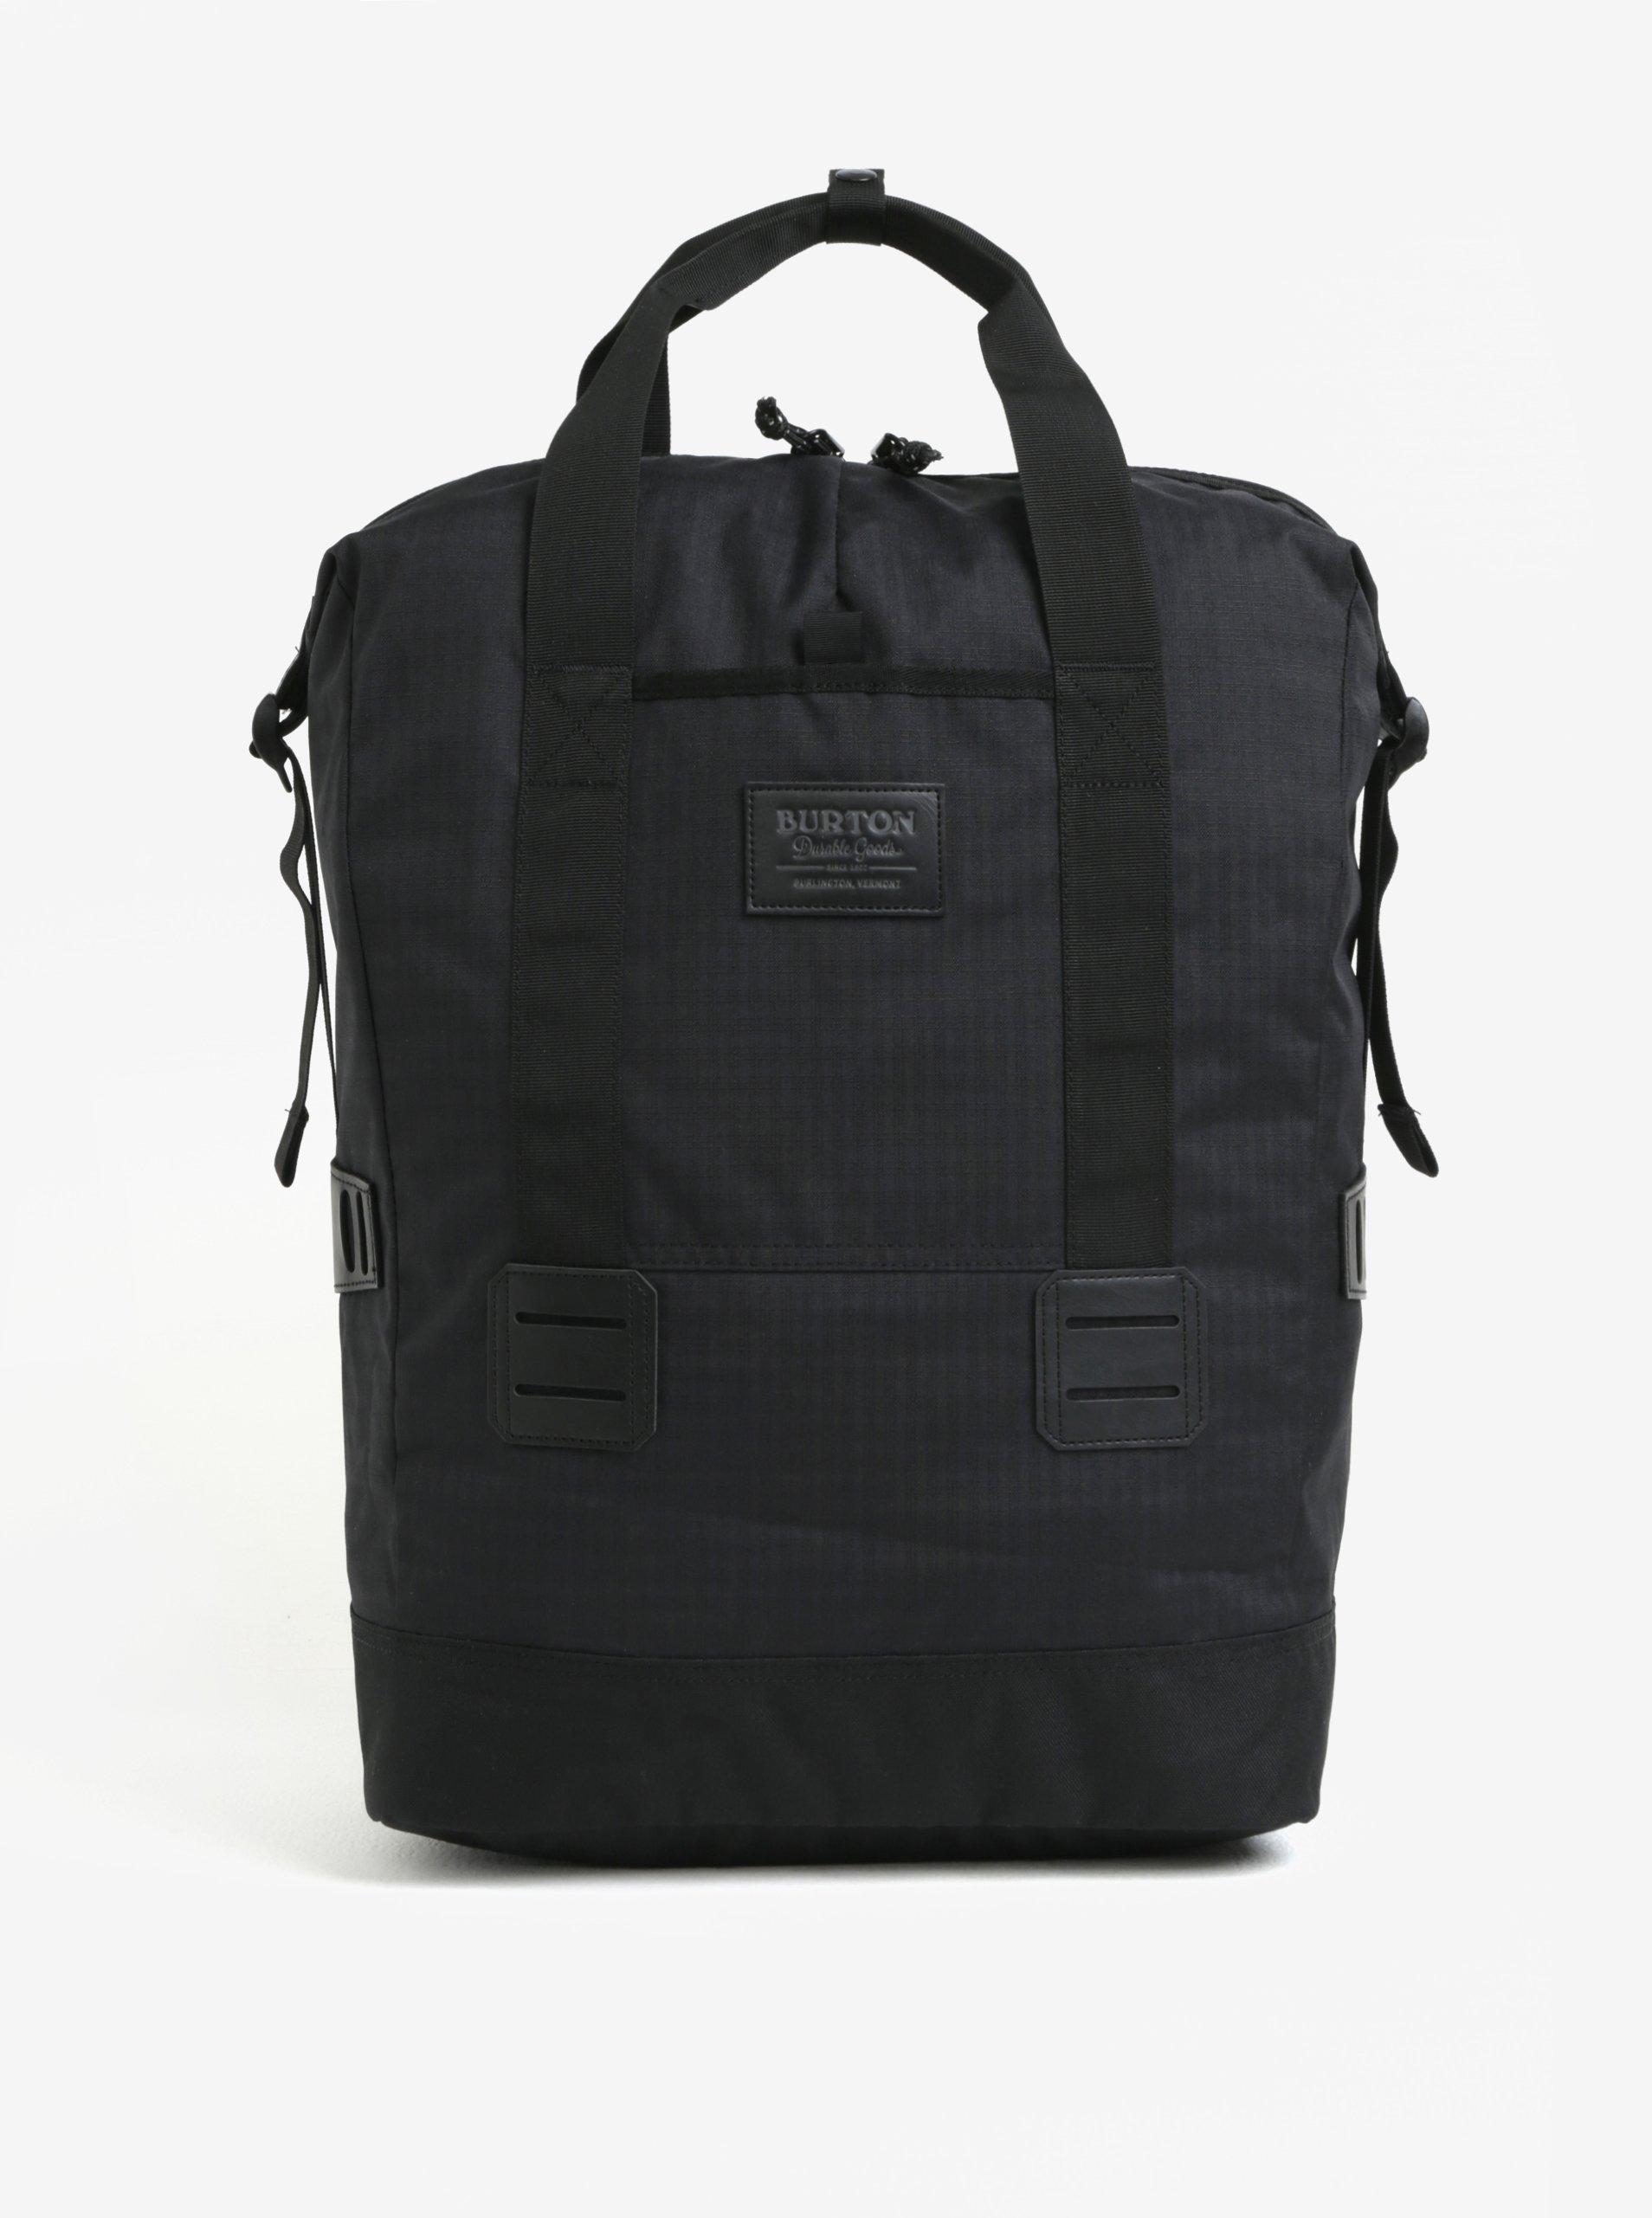 Černý batoh/taška Burton Tinder tote 25 l